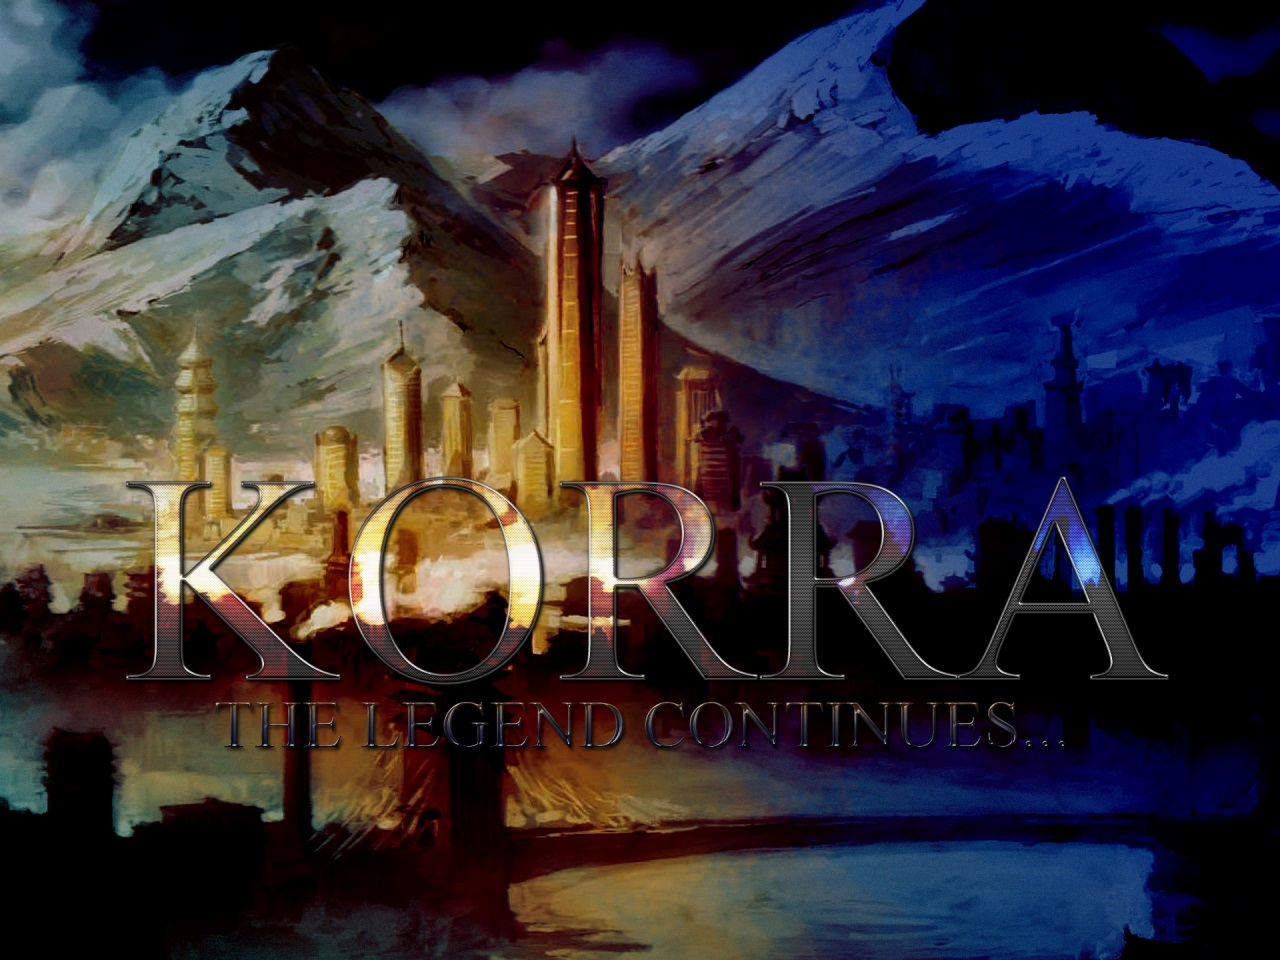 The Legend of Korra wallpaper 7